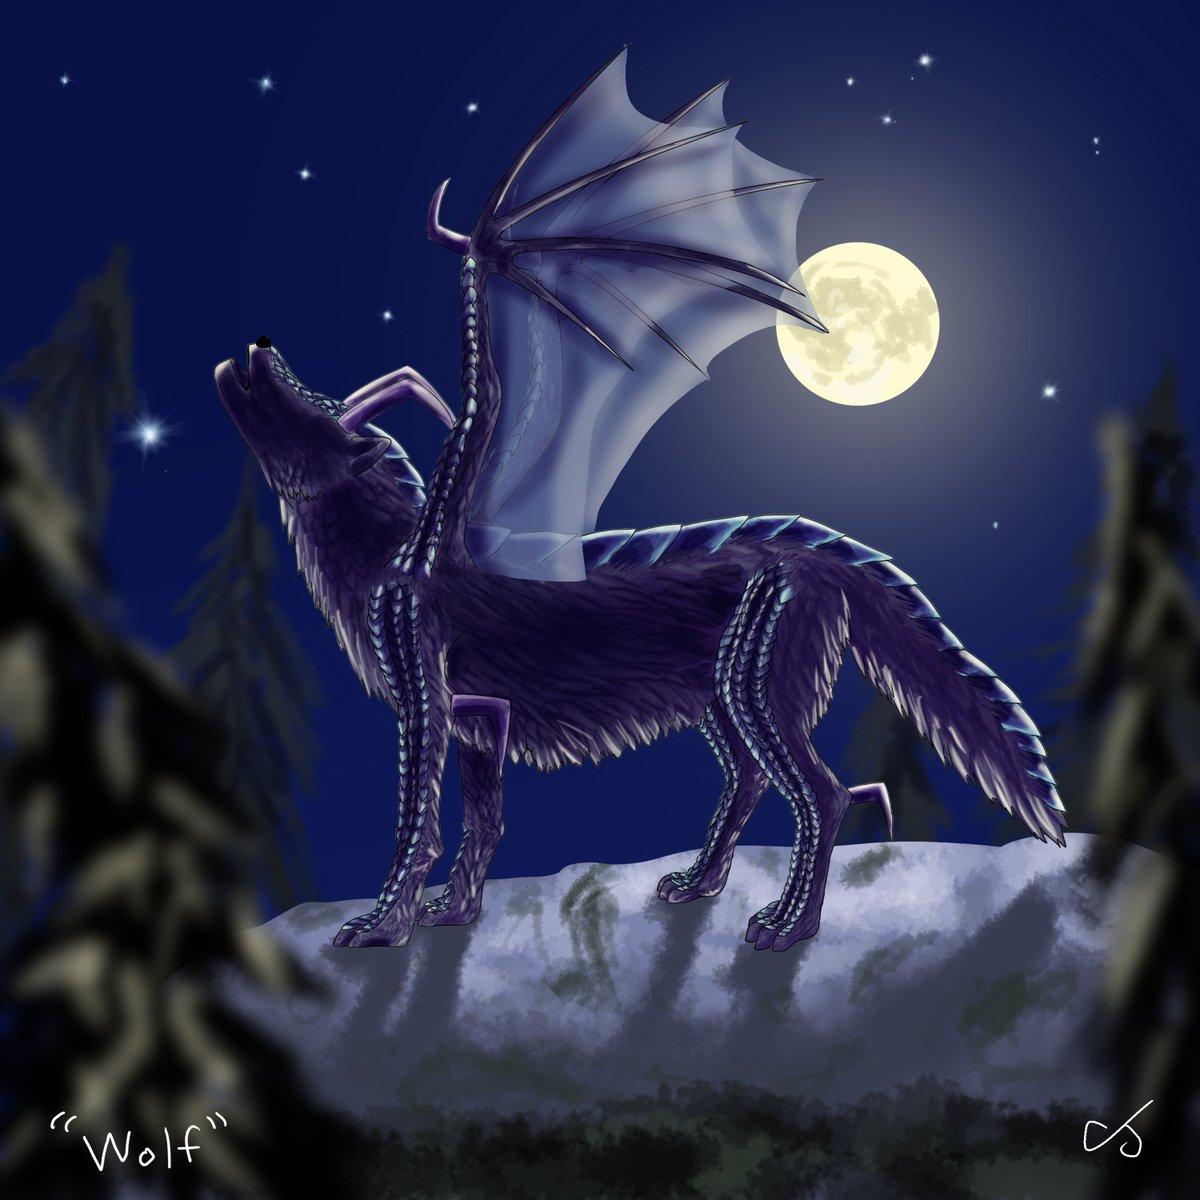 Smaugust day 4: Wolf  #smaugust #smaugust2020 #smaugust2020day4 #dragon #dragonpainting #dragonartwork #dragonart #wolf #howl #howling #wolfdragon #howlingwolf #digital #digitalpainting #digitalart #digitalartwork #digitalillustration #original #originalart #originalartworkpic.twitter.com/kTfFvRBJ5N